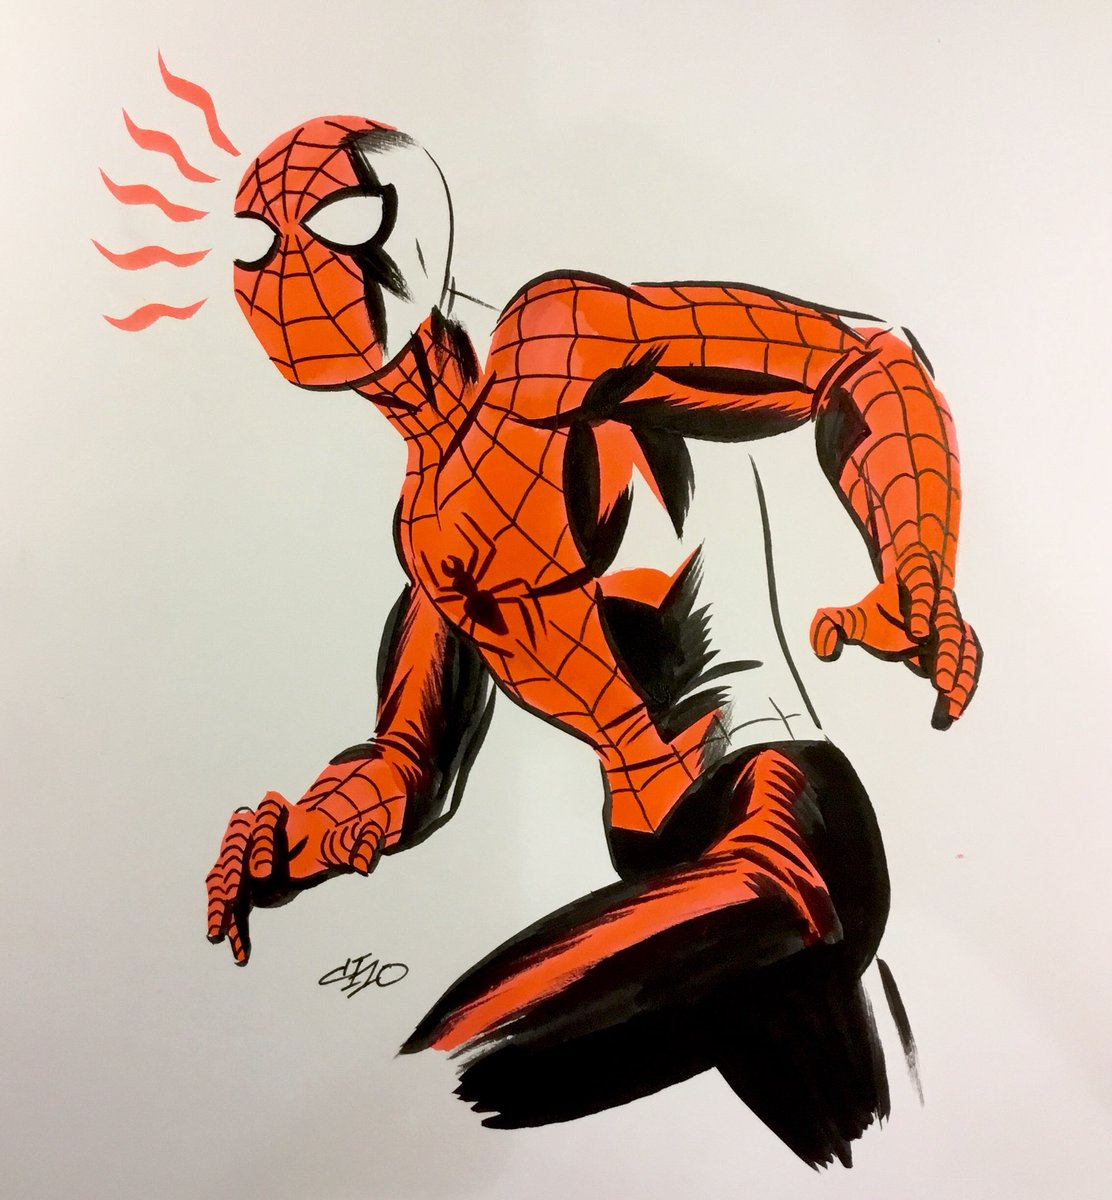 Spider-man, in ink and Dr. Martin dyes. https://t.co/V3re7zP5Av